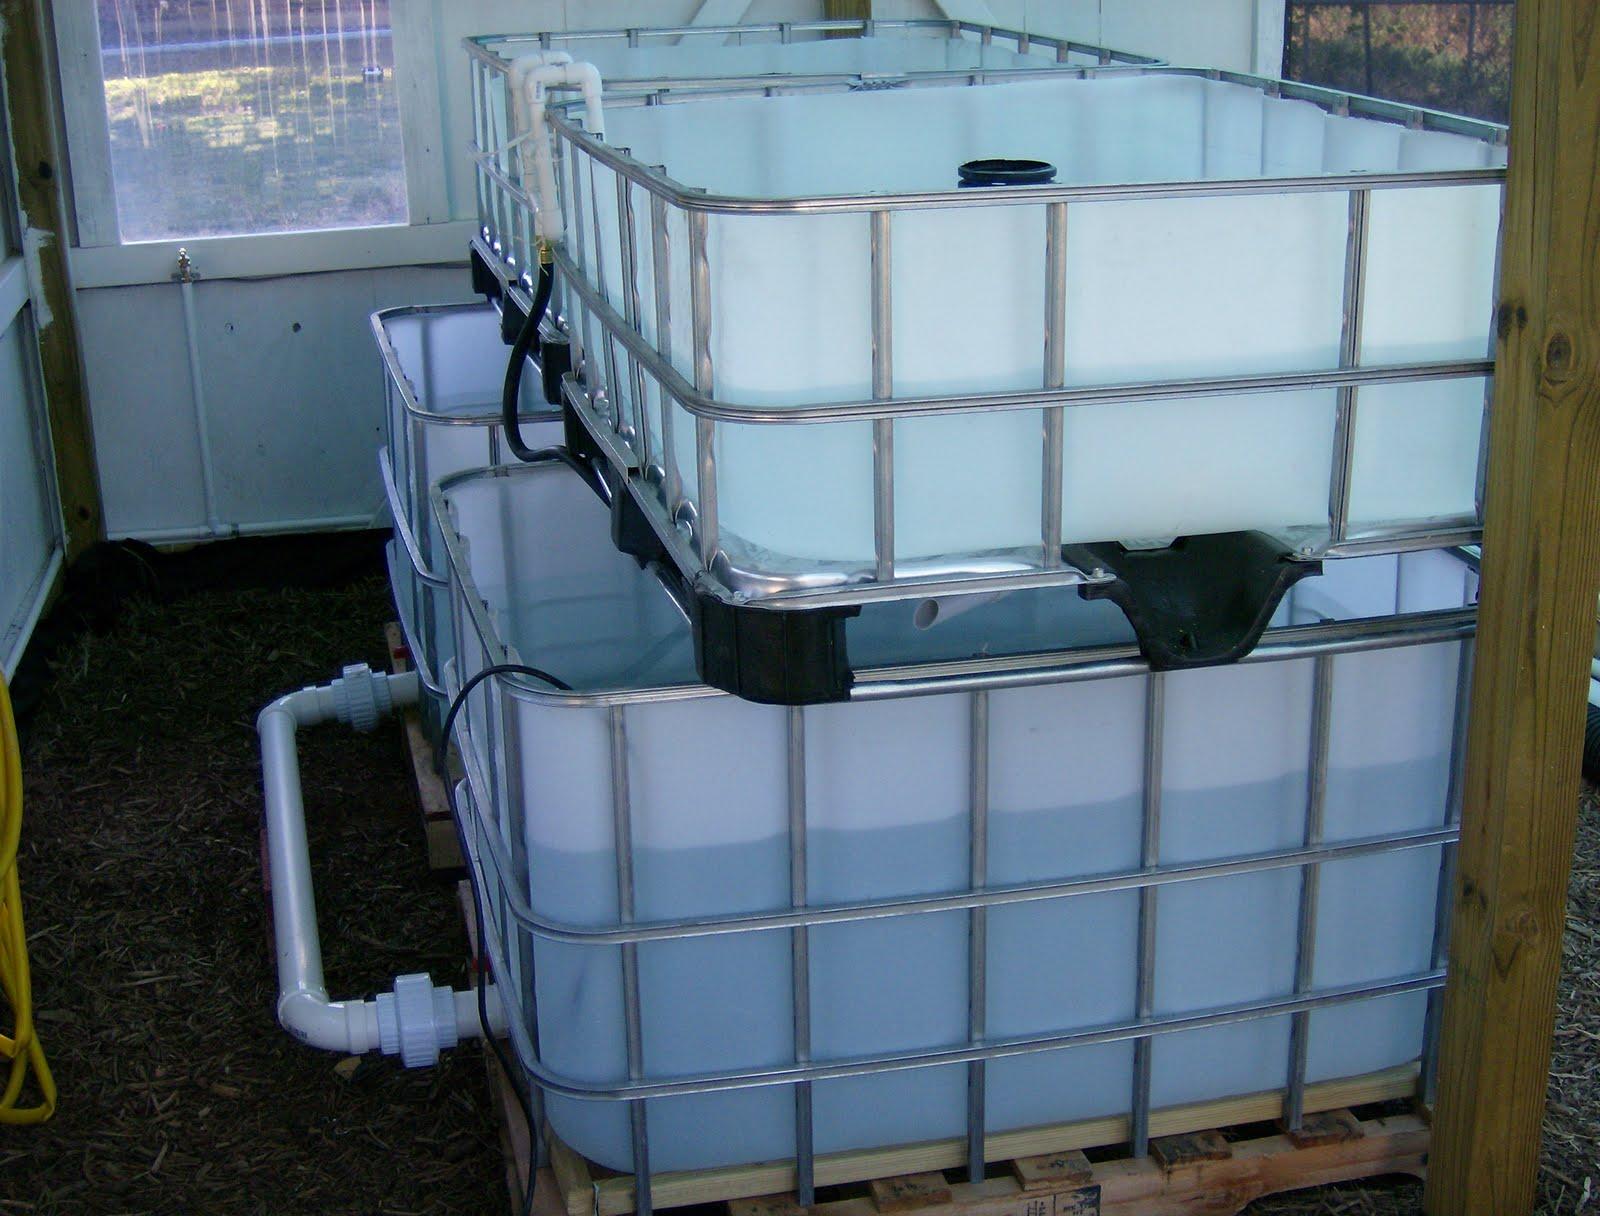 How To Build An Ibc Aquaponics System